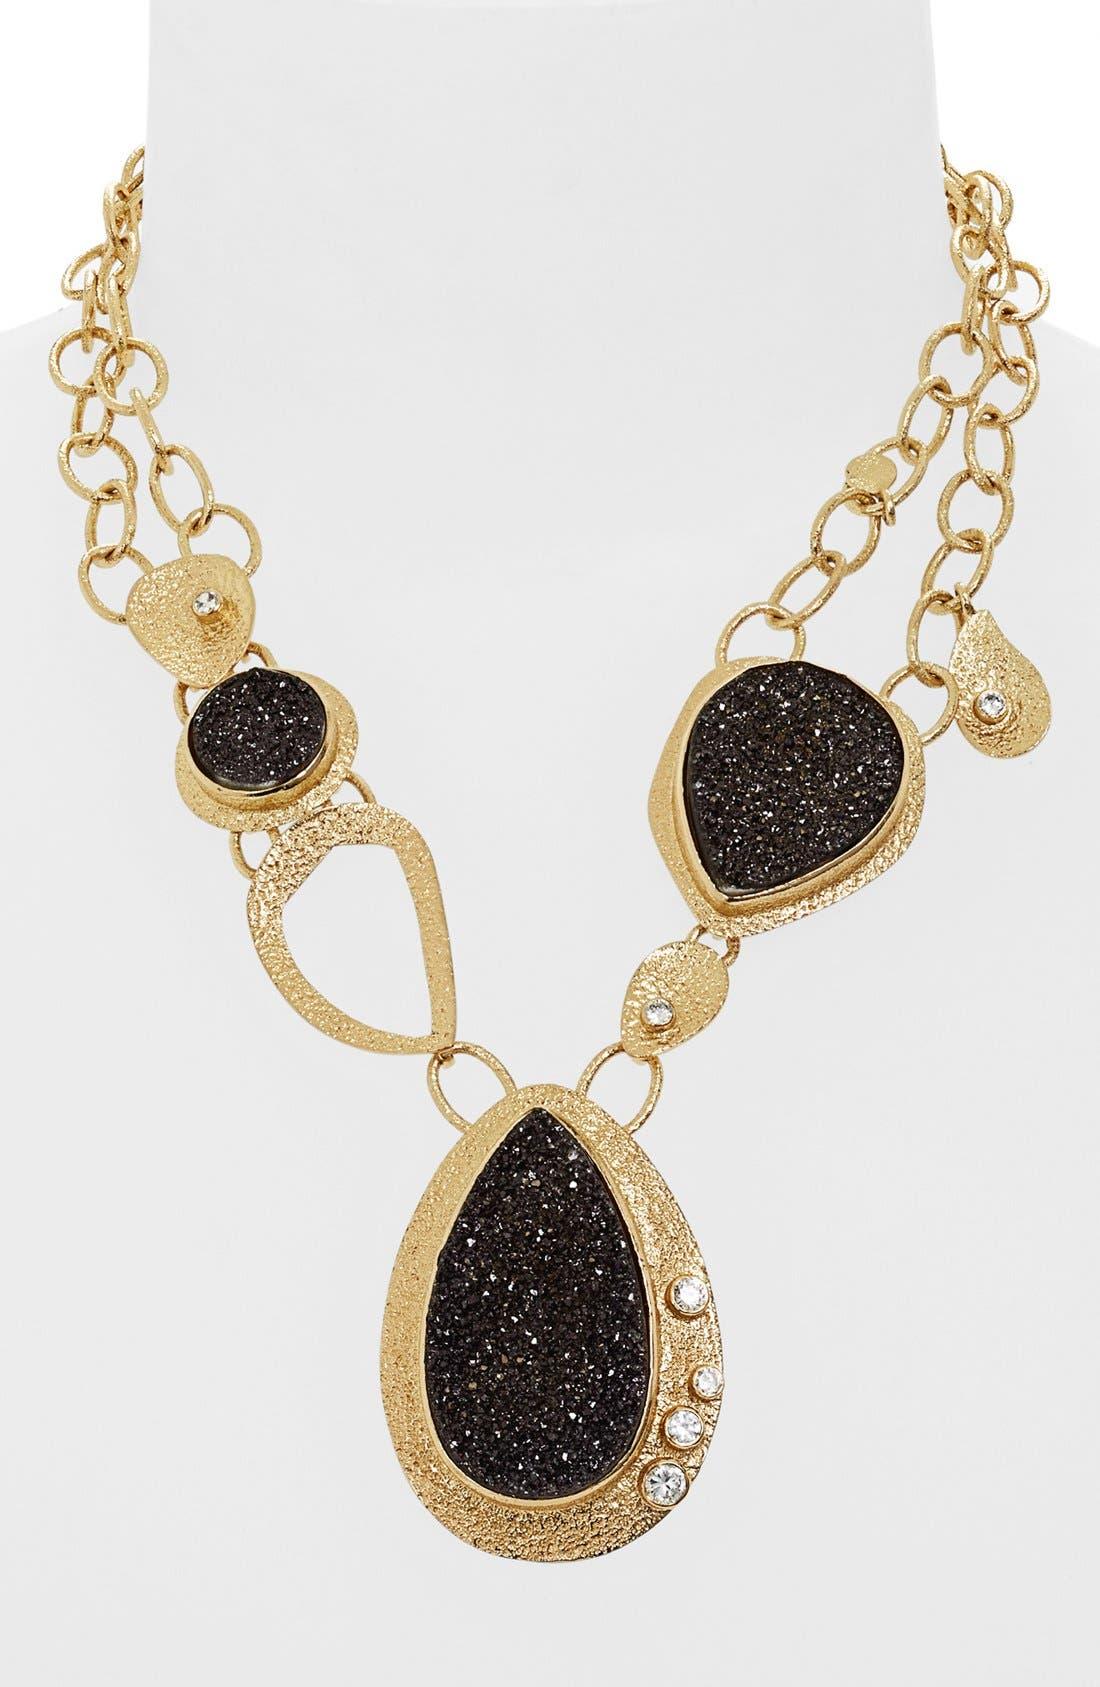 Alternate Image 1 Selected - Melinda Maria 'Gaia' Drusy Necklace